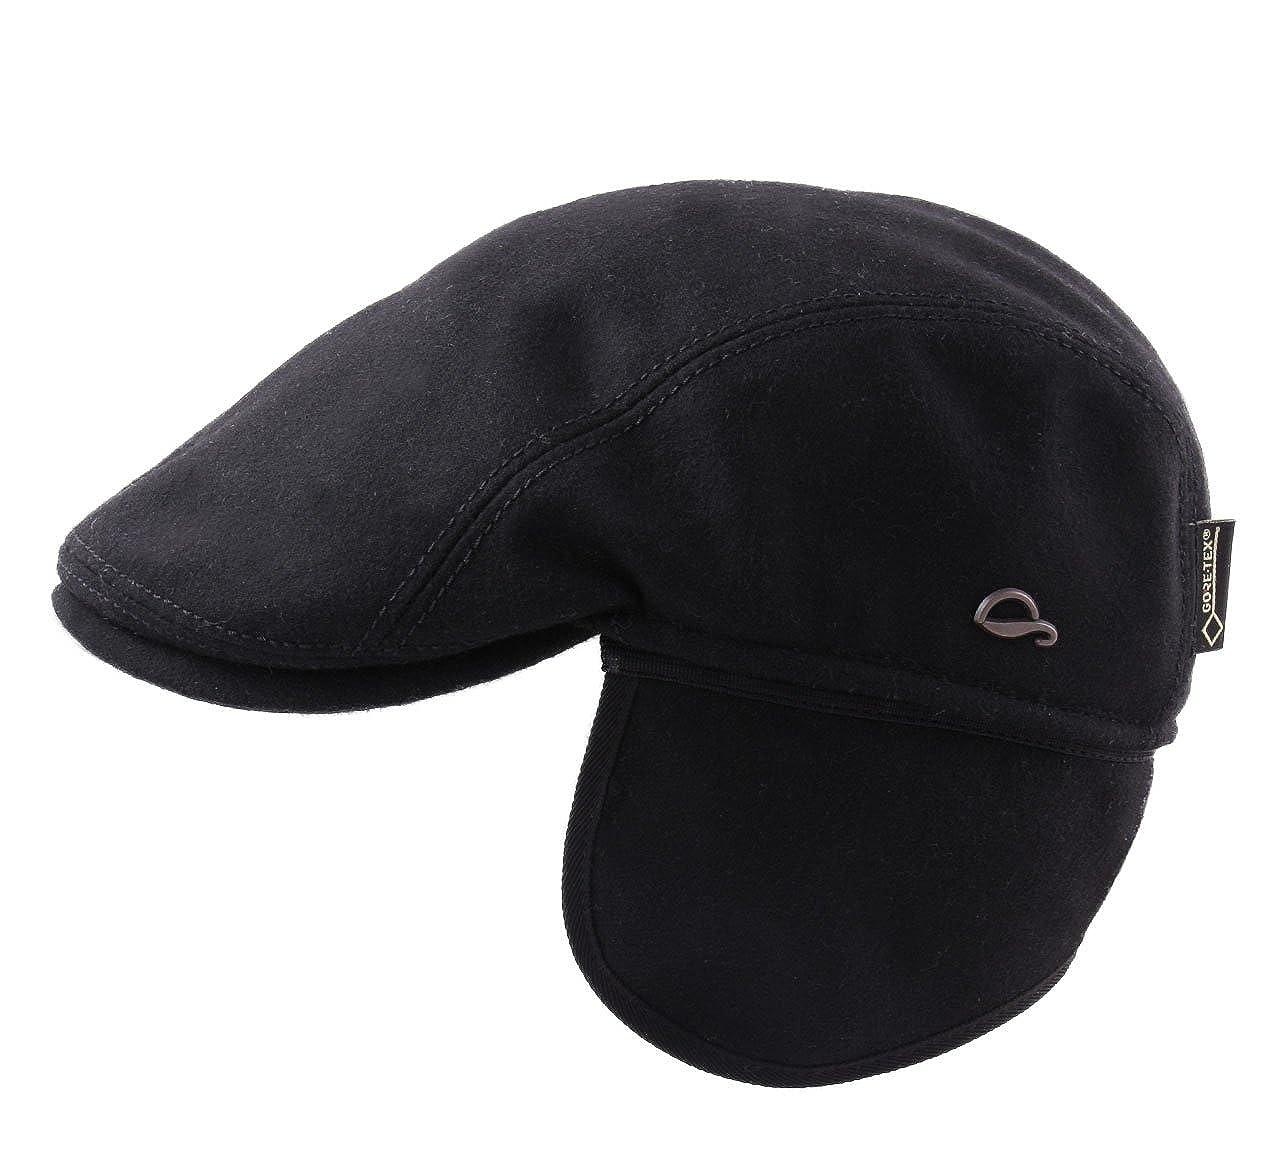 6f662c9c7 Gottmann Men's Jackson-K-G Flat Cap at Amazon Men's Clothing store: